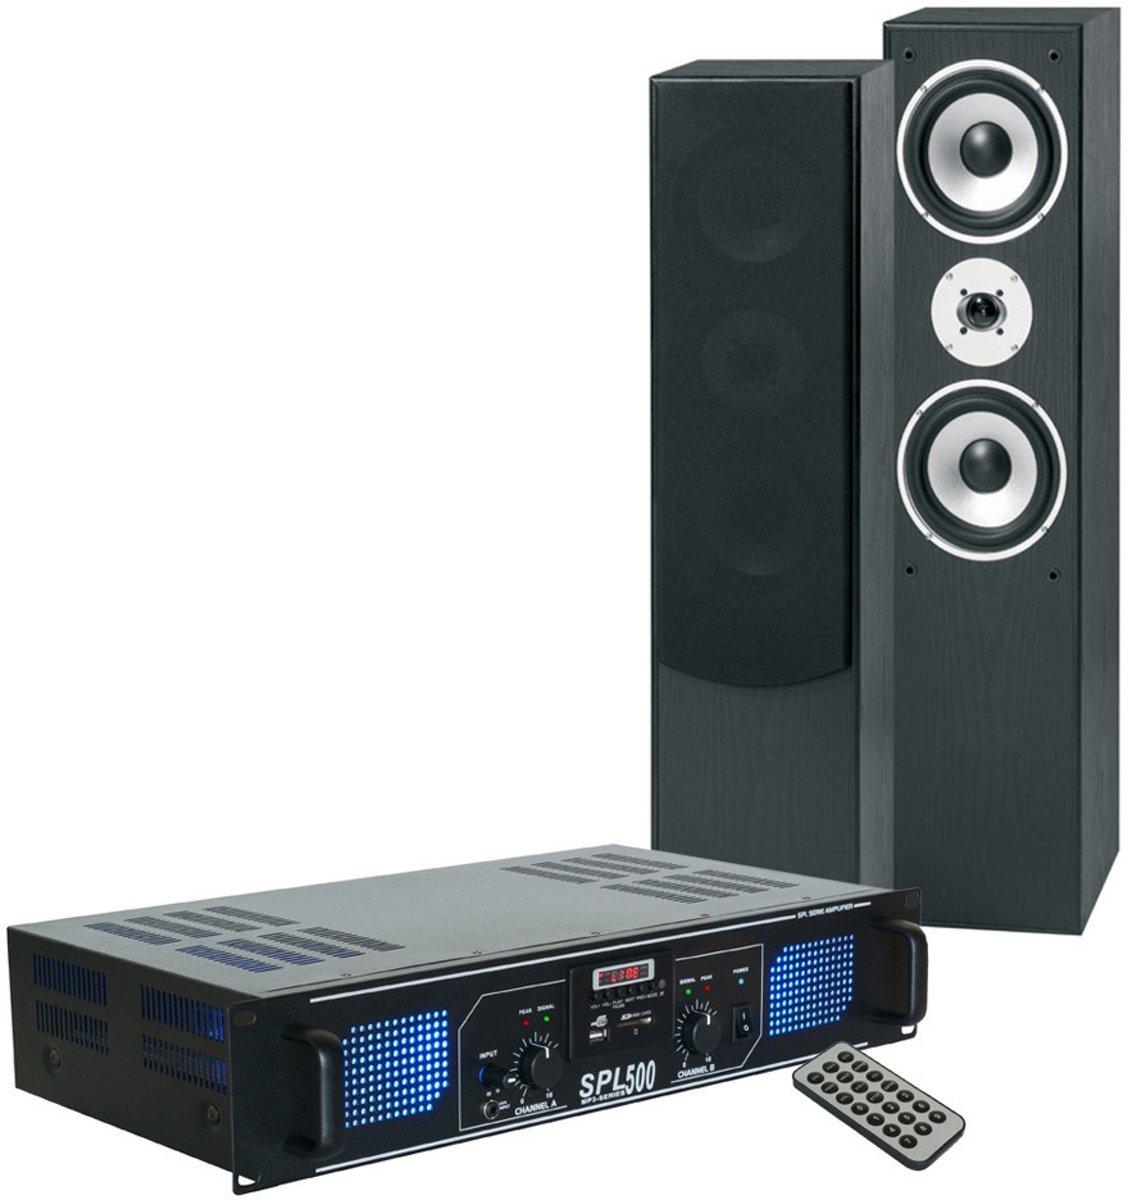 SkyTronic stereo installatie met versterker, speakers & kabel